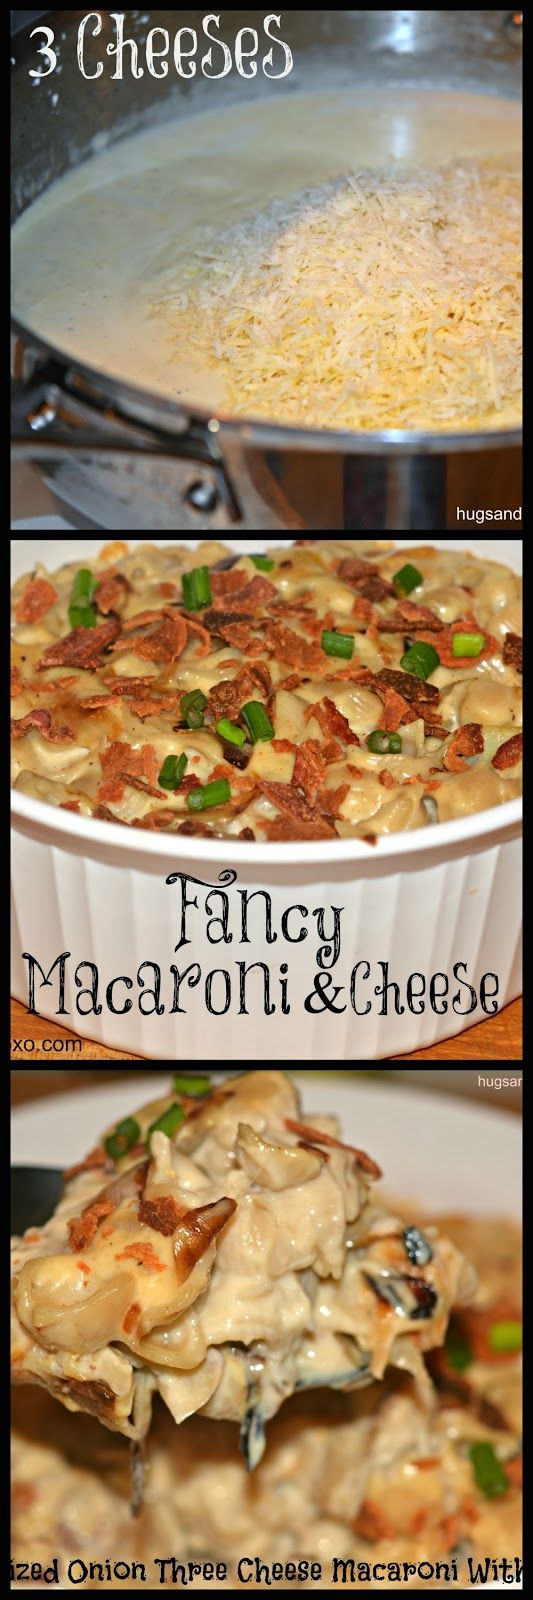 ONIONS & BACON!!! Fancy Macaroni And Cheese, Cheese Macaroni ...